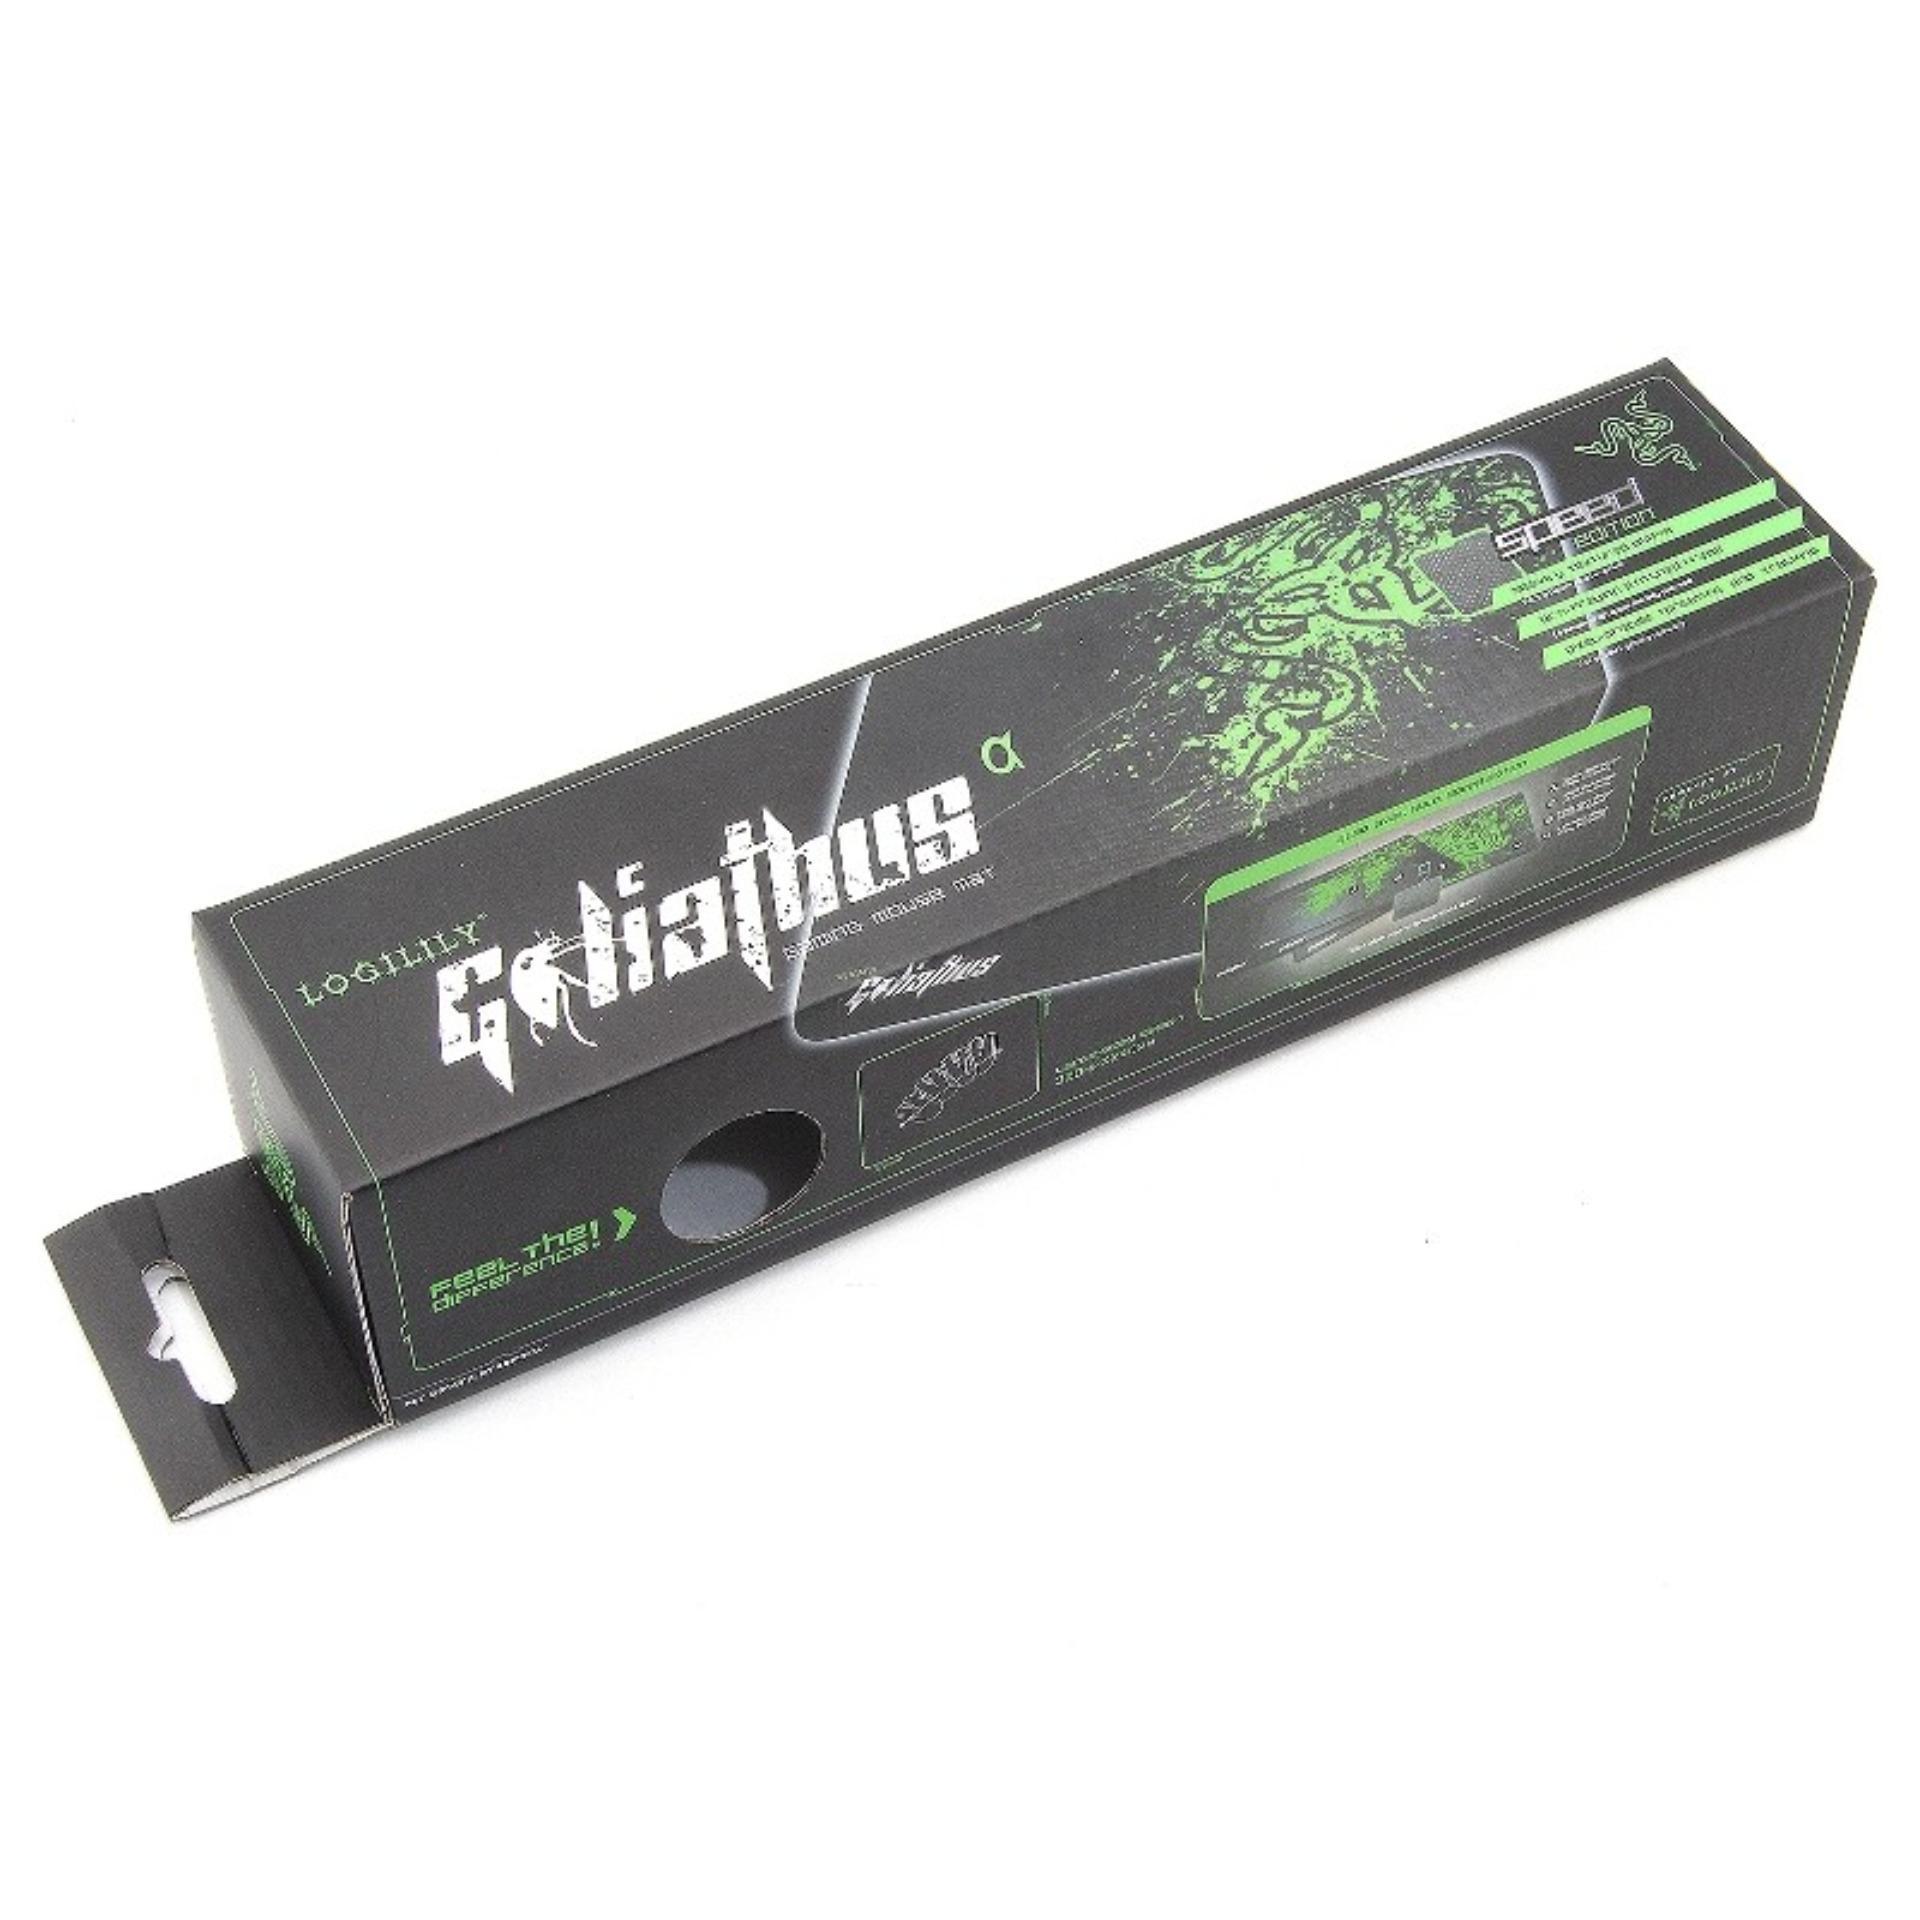 Fantech Mousepad Mp80 Extra Besar Gaming Speed Control Jahit Pinggir Mp35 Loose Pack Atau Tanpa Packing Razer Edition Jahitpinggir 310x245x3mm